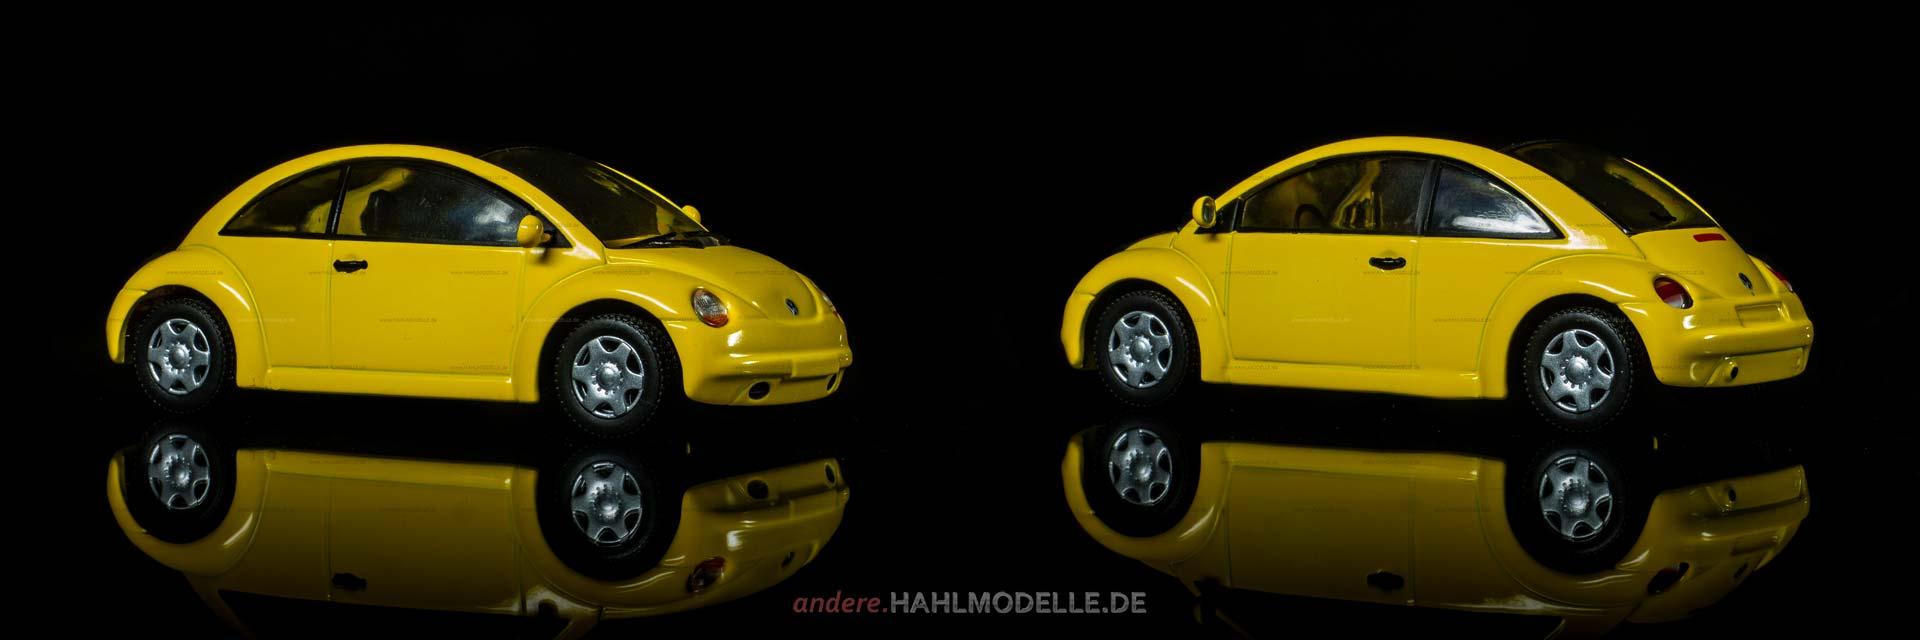 Volkswagen Concept 1 | Limousine | Minichamps | 1:43 | www.andere.hahlmodelle.de